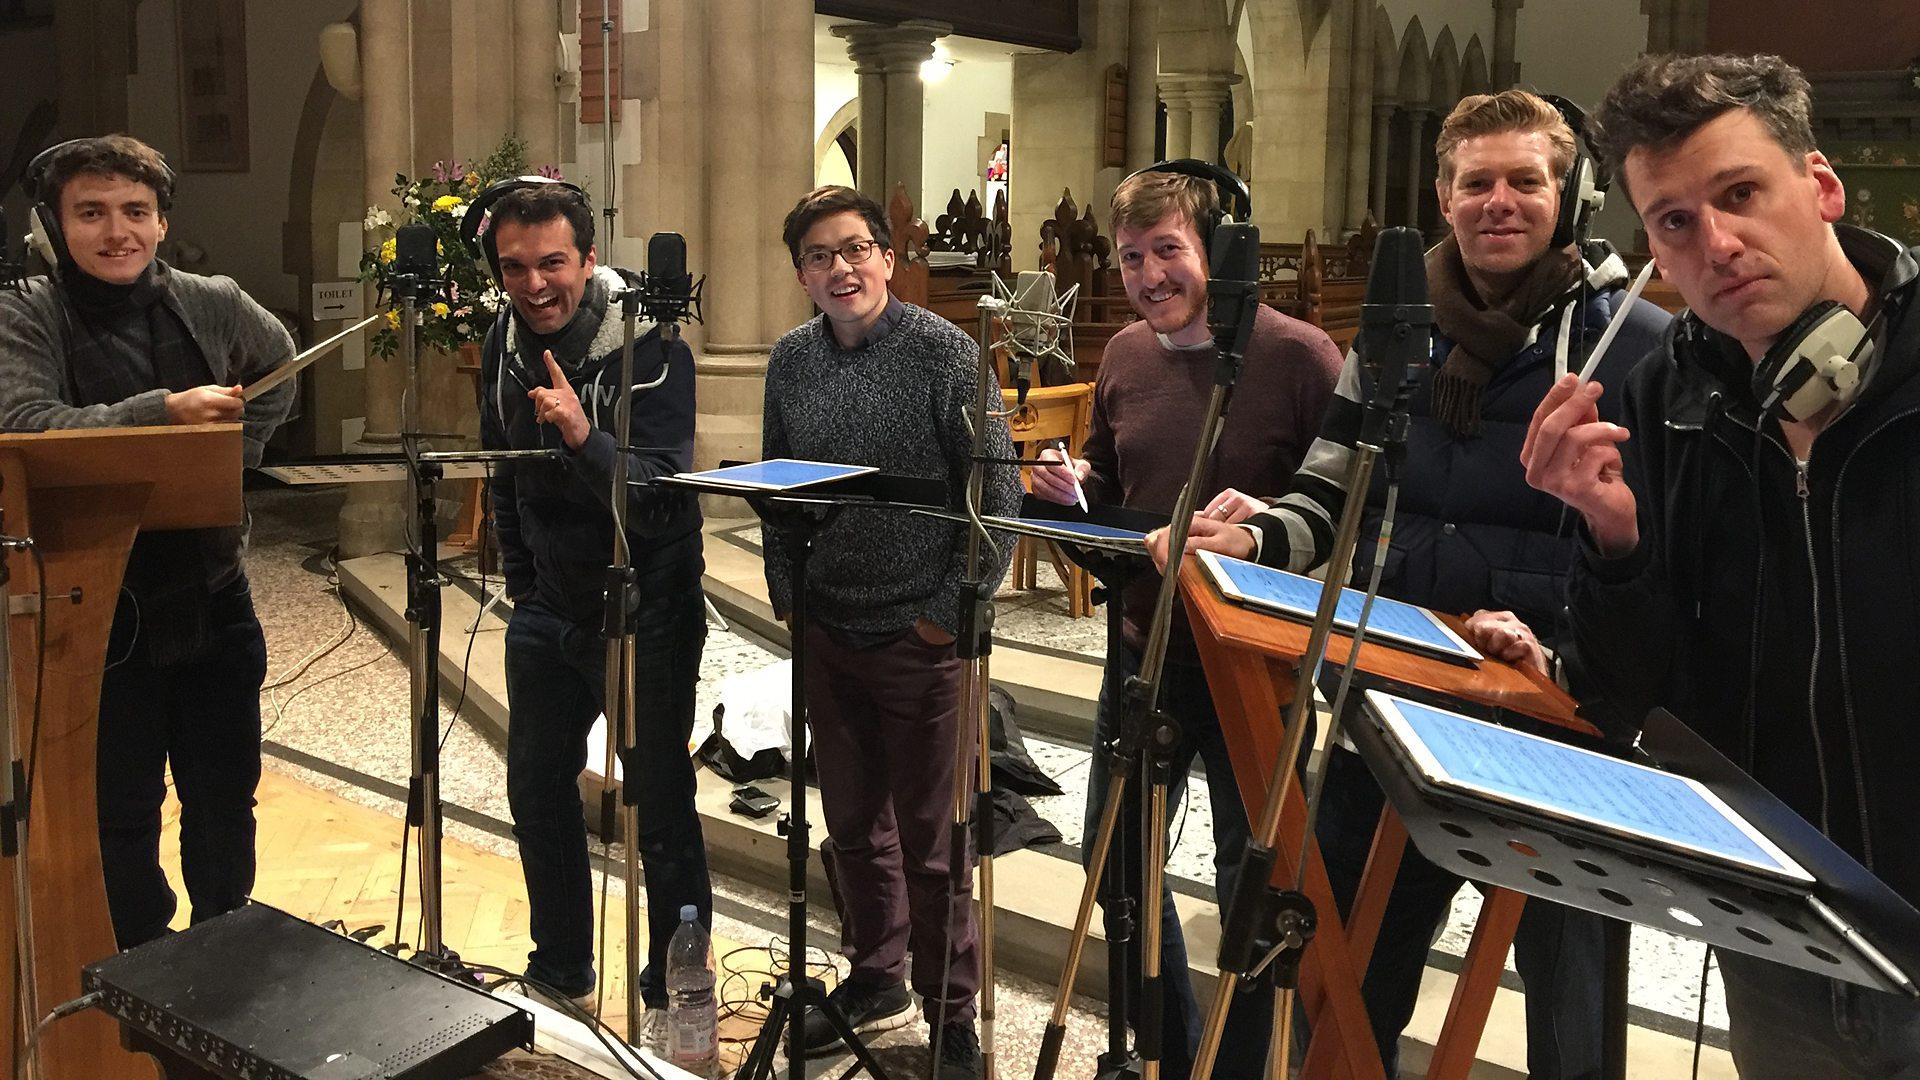 8f3f45ee9da BBC Radio 3 - Choir and Organ - 11 ways to make your choir sparkle ...